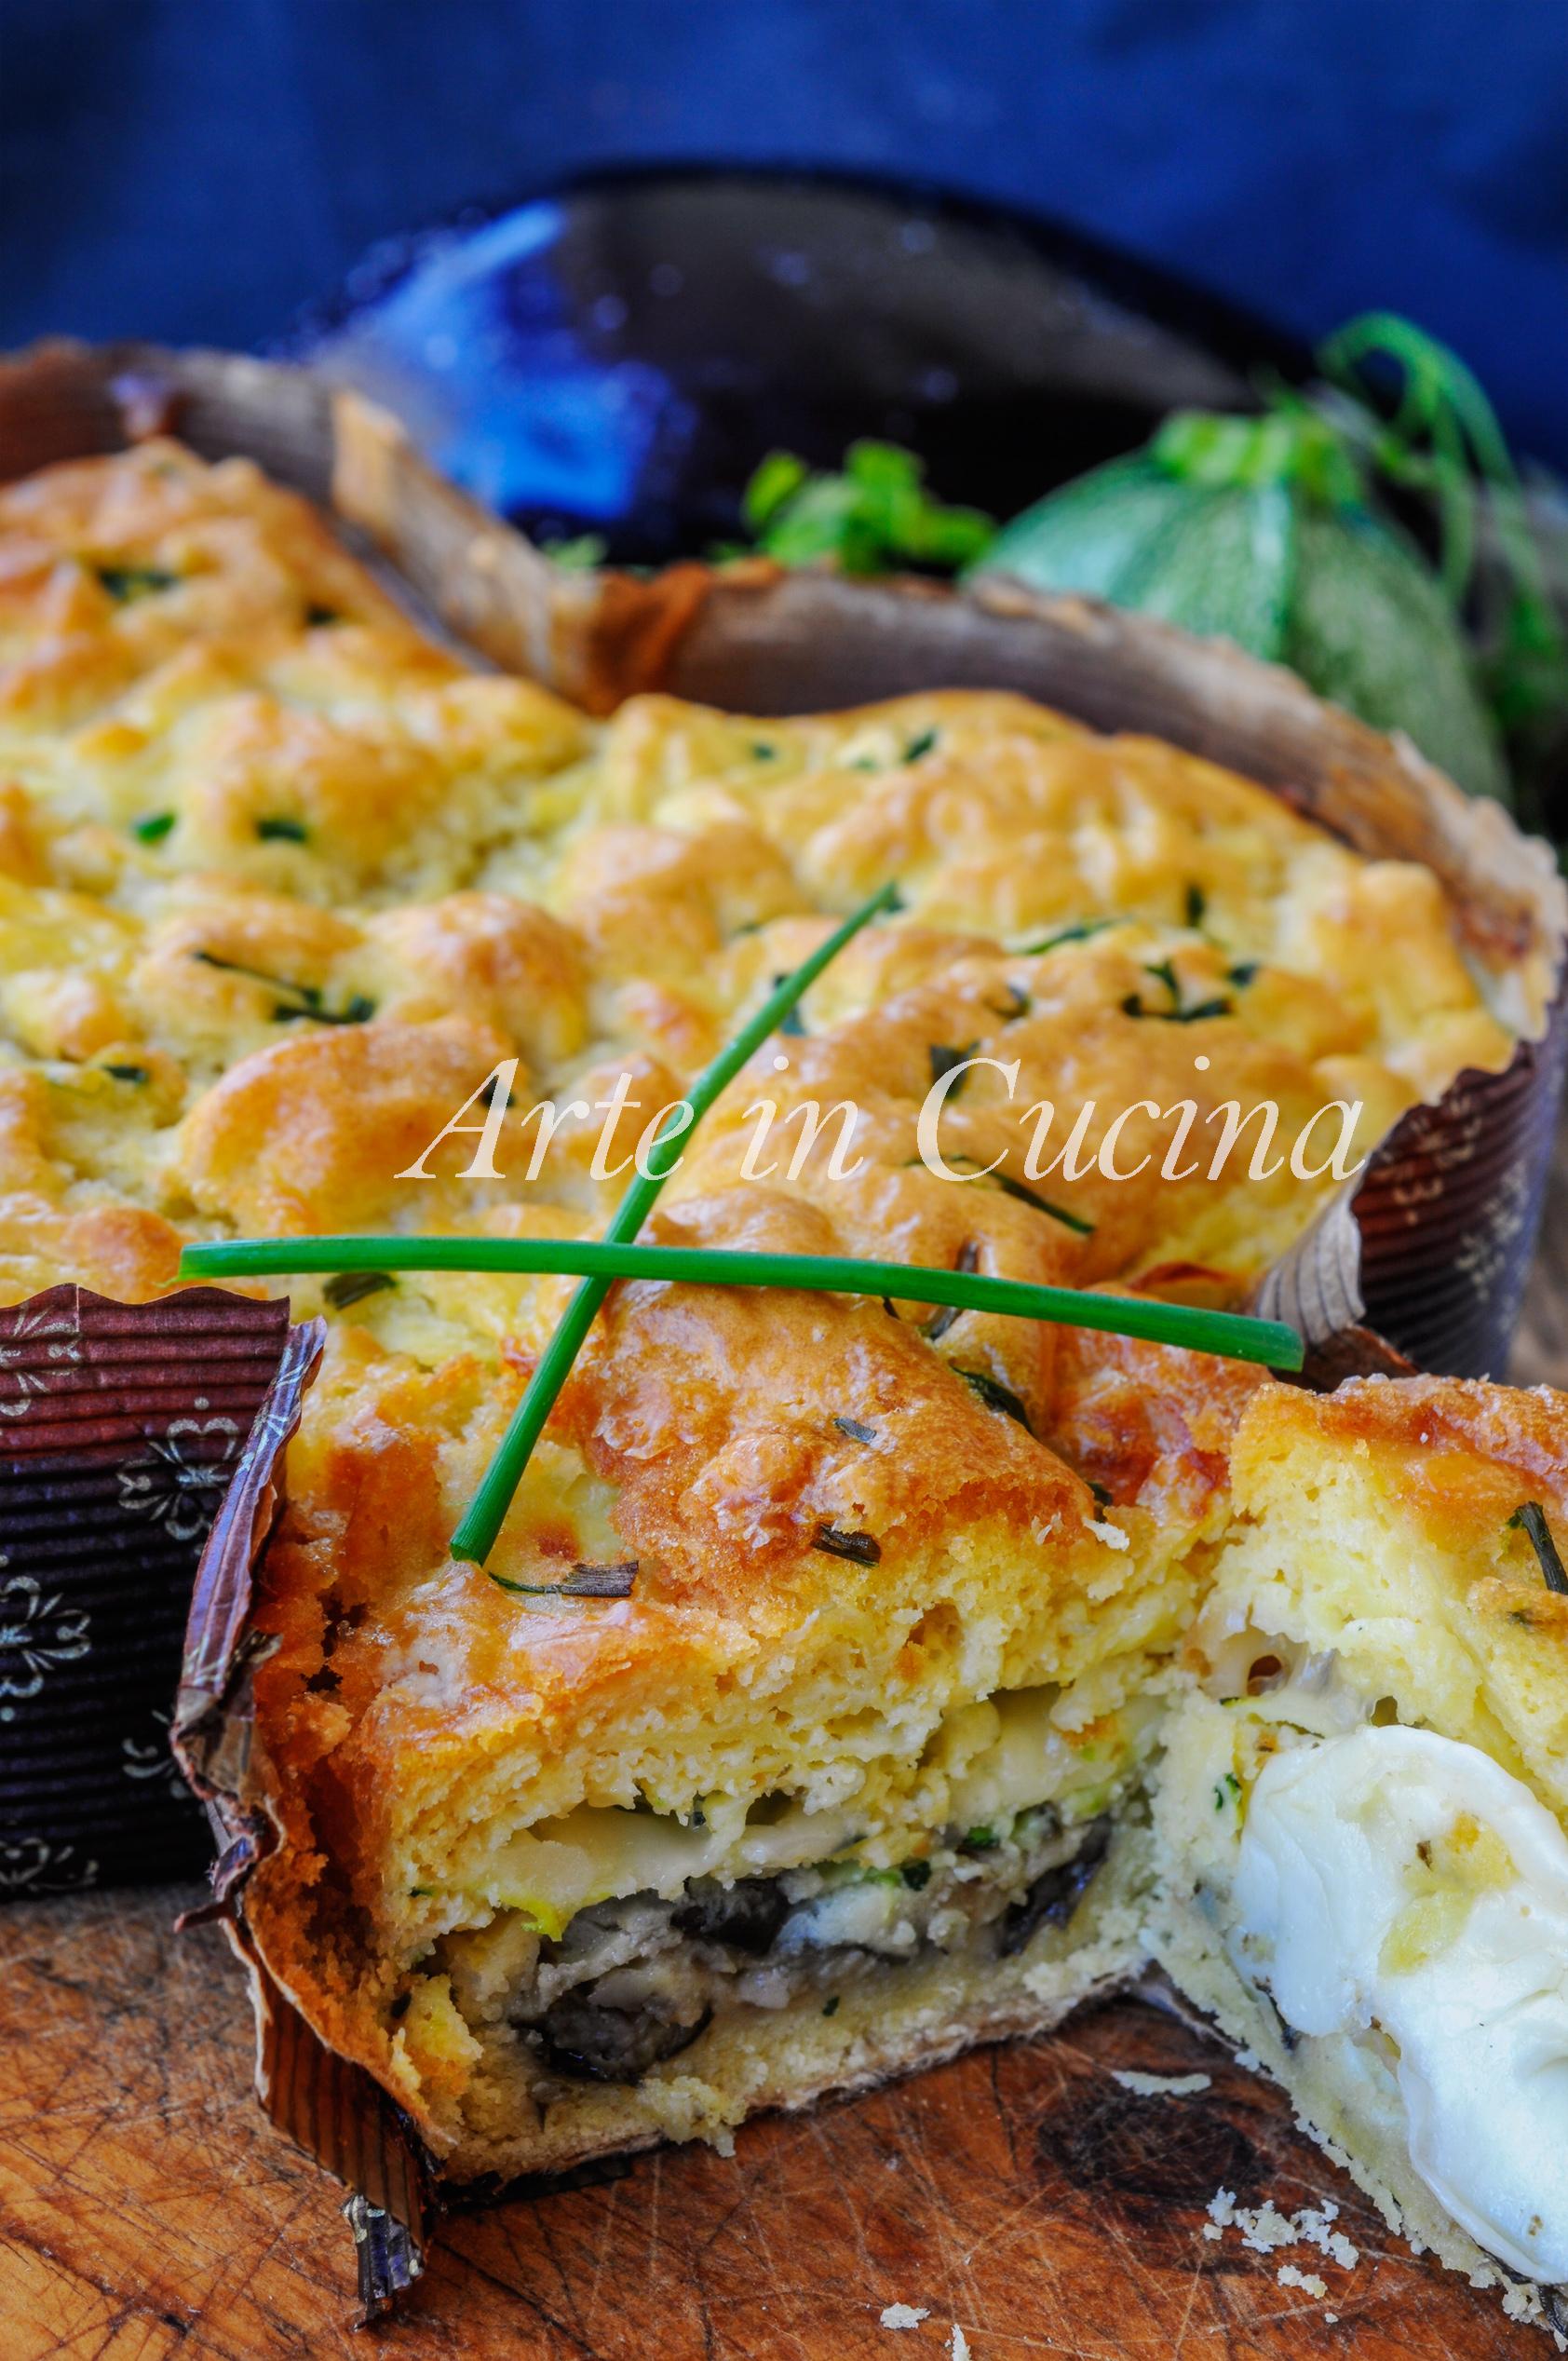 Colomba salata con verdure in crosta di patate vickyart arte in cucina